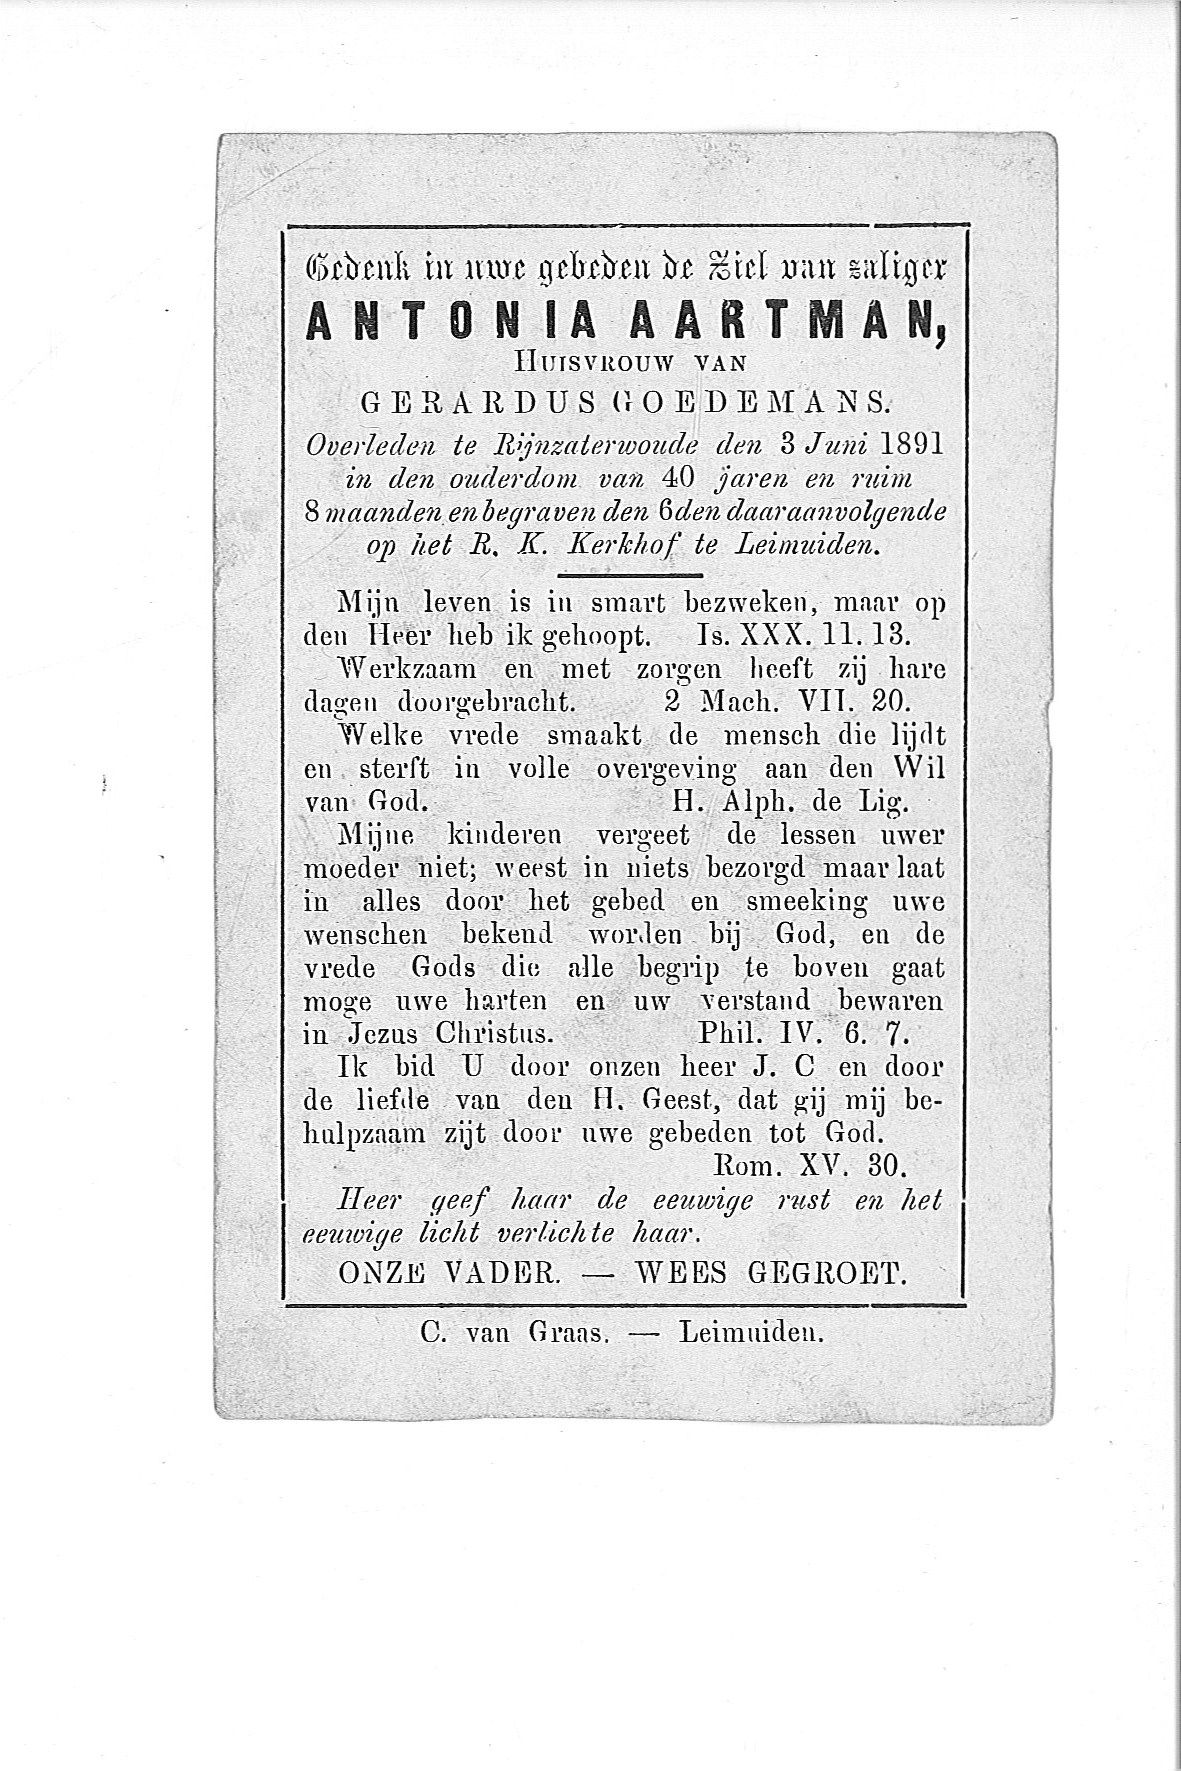 antonia(1891)20090129111115_00001.jpg